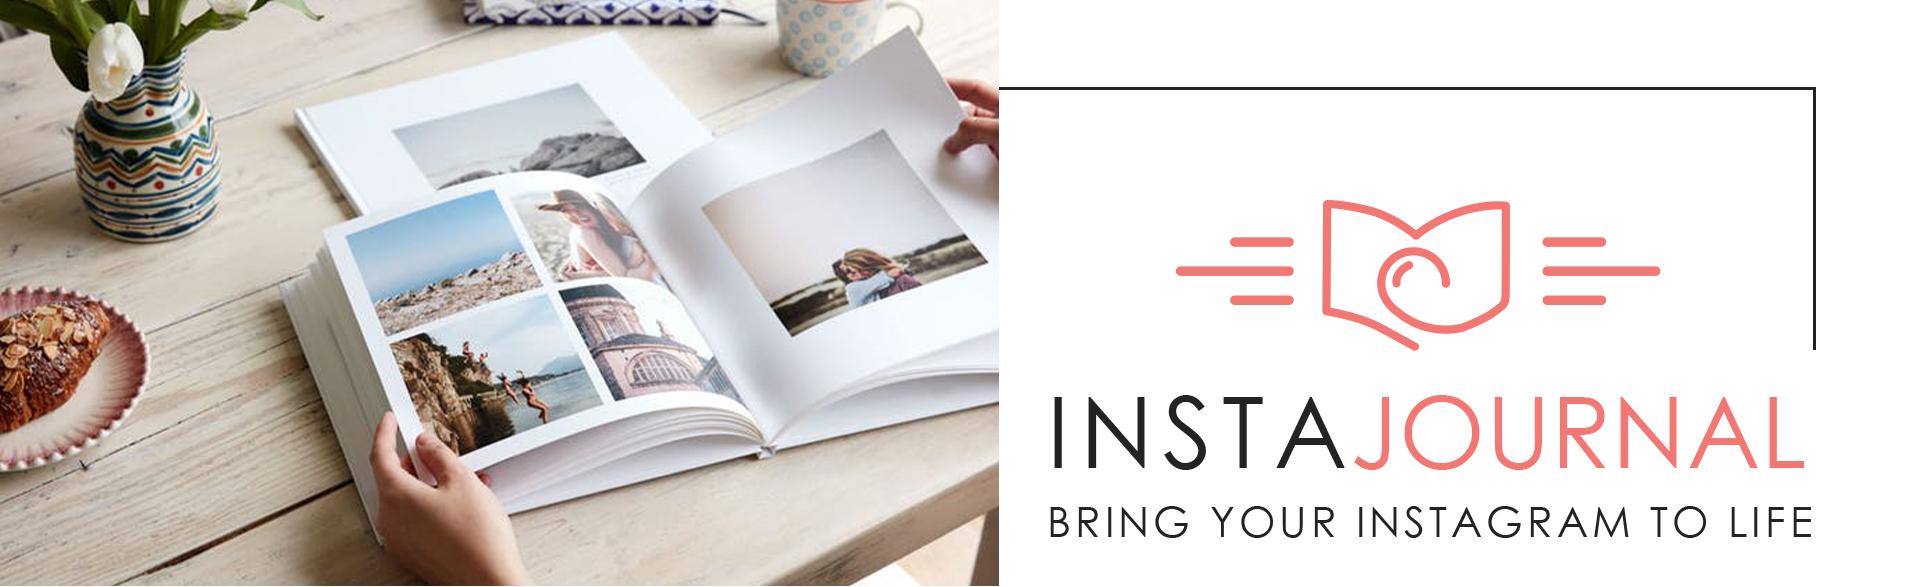 Insta Journal Banner